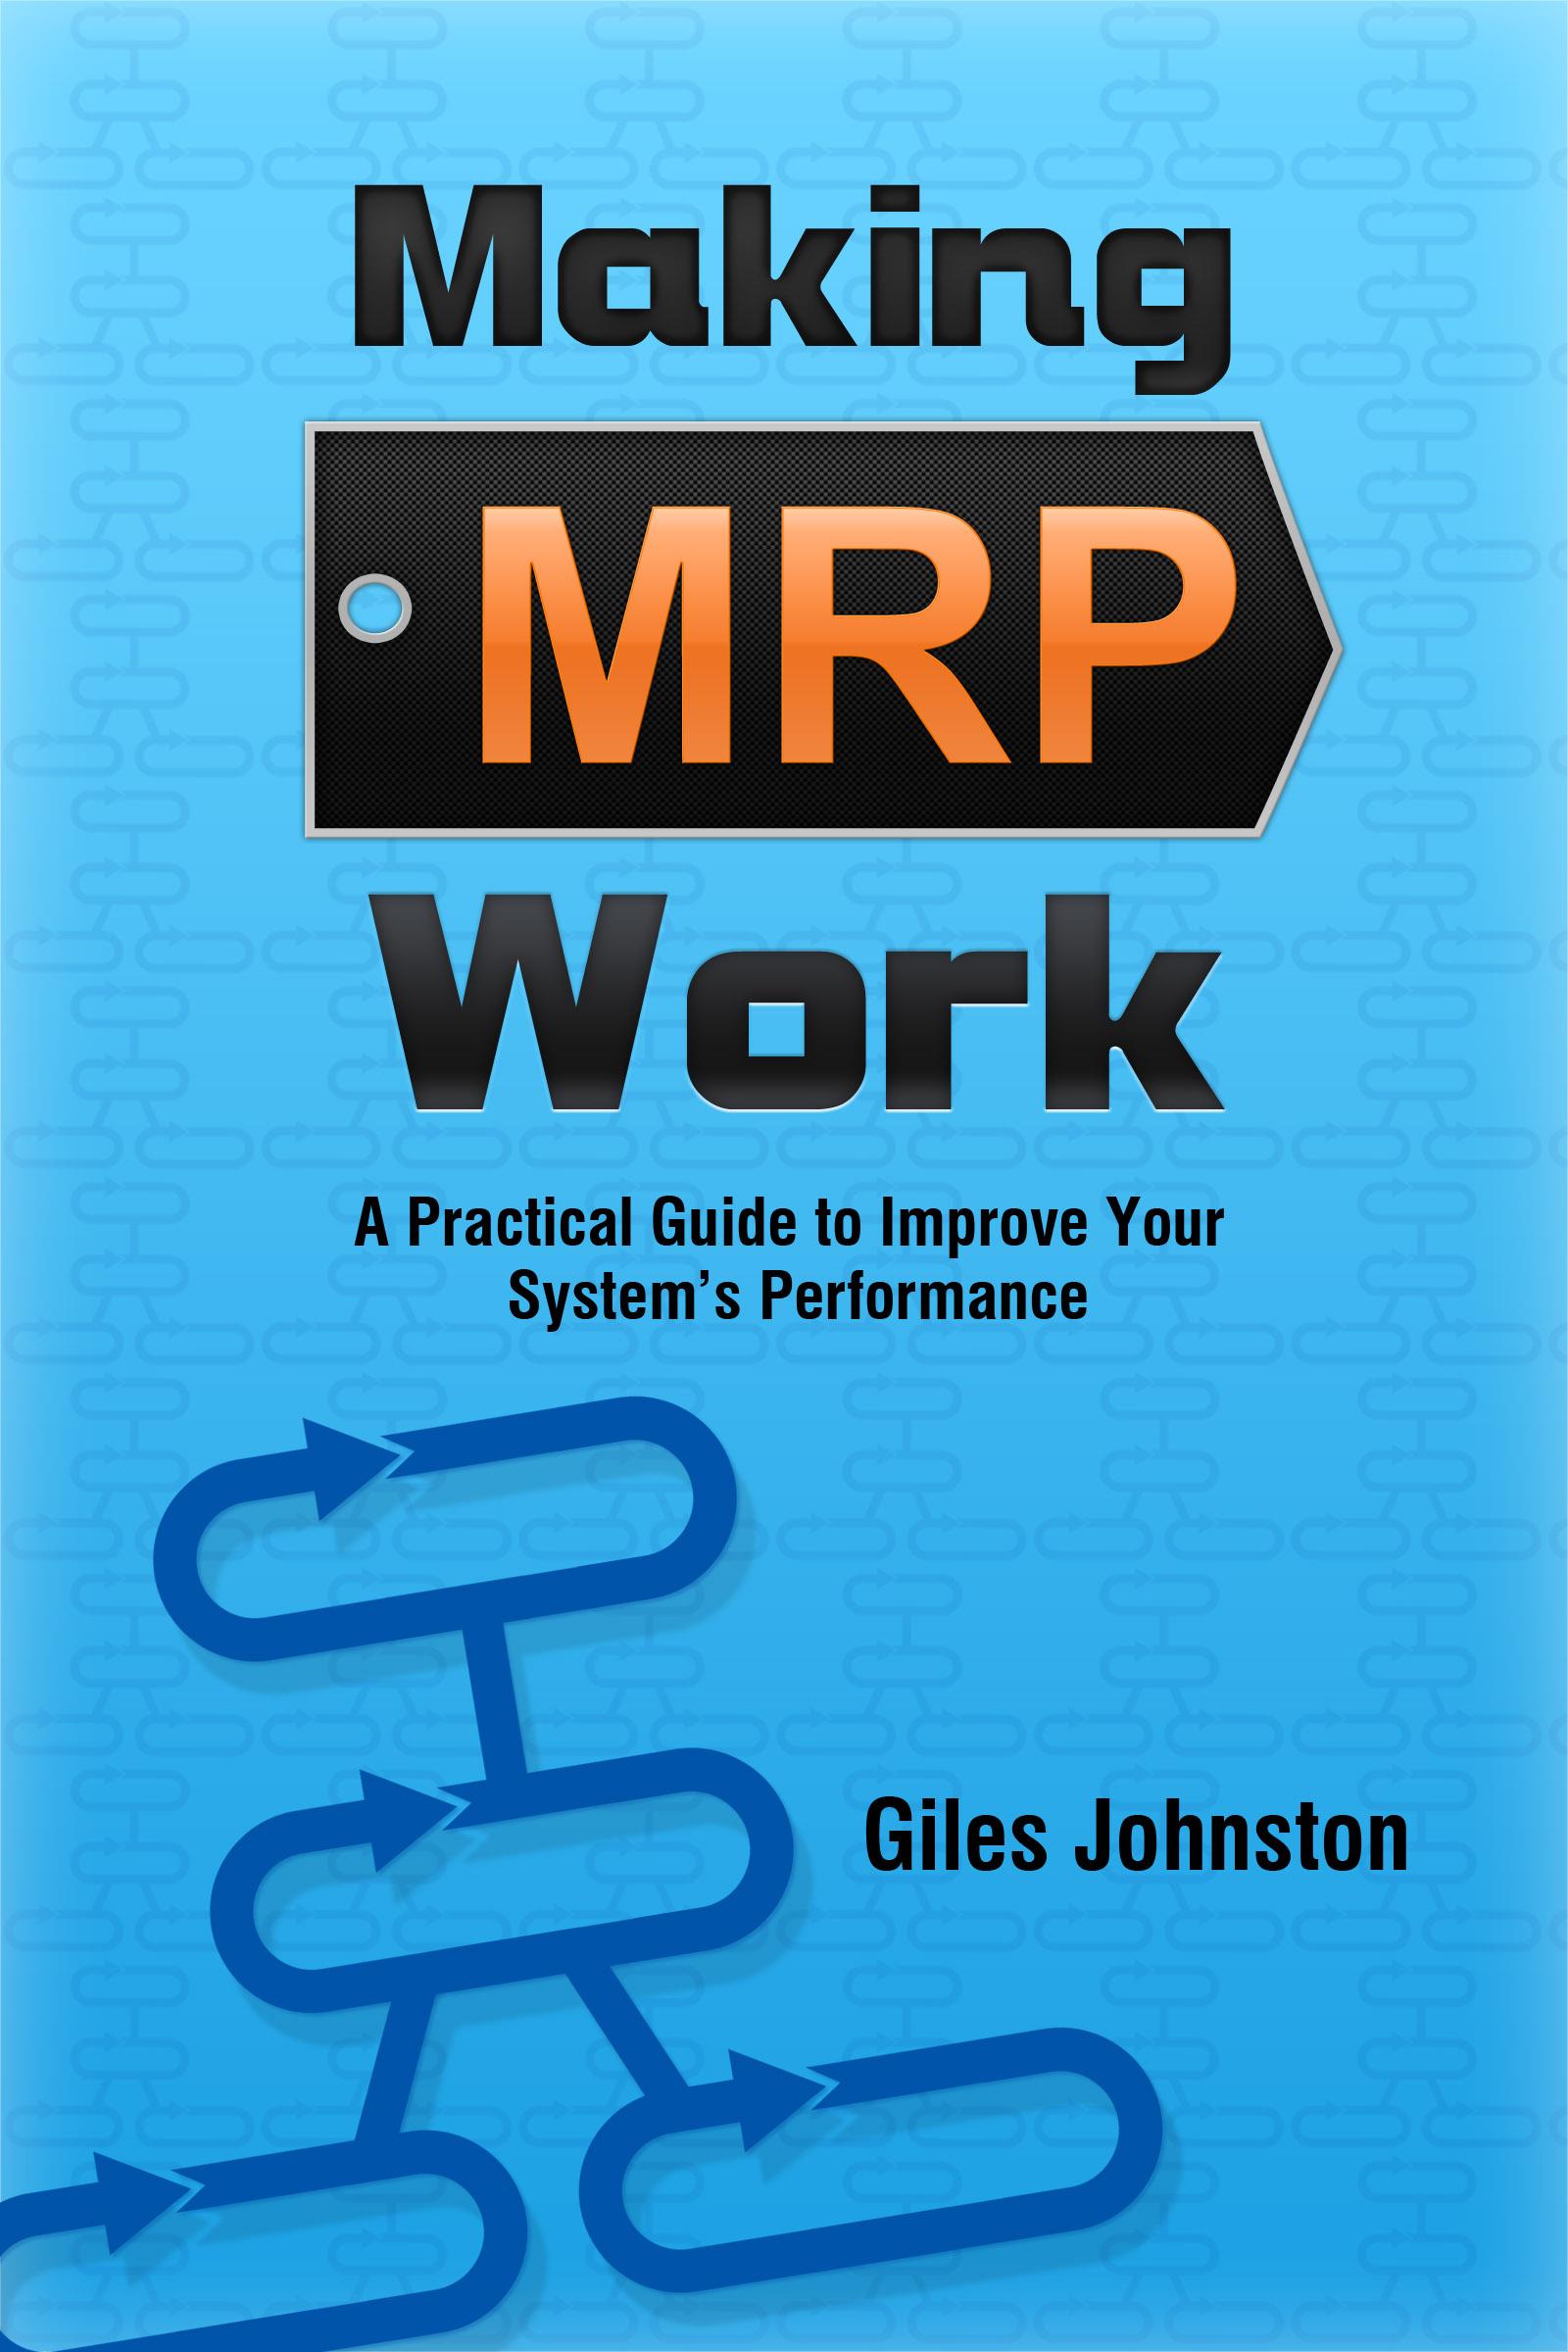 Making MRP Work